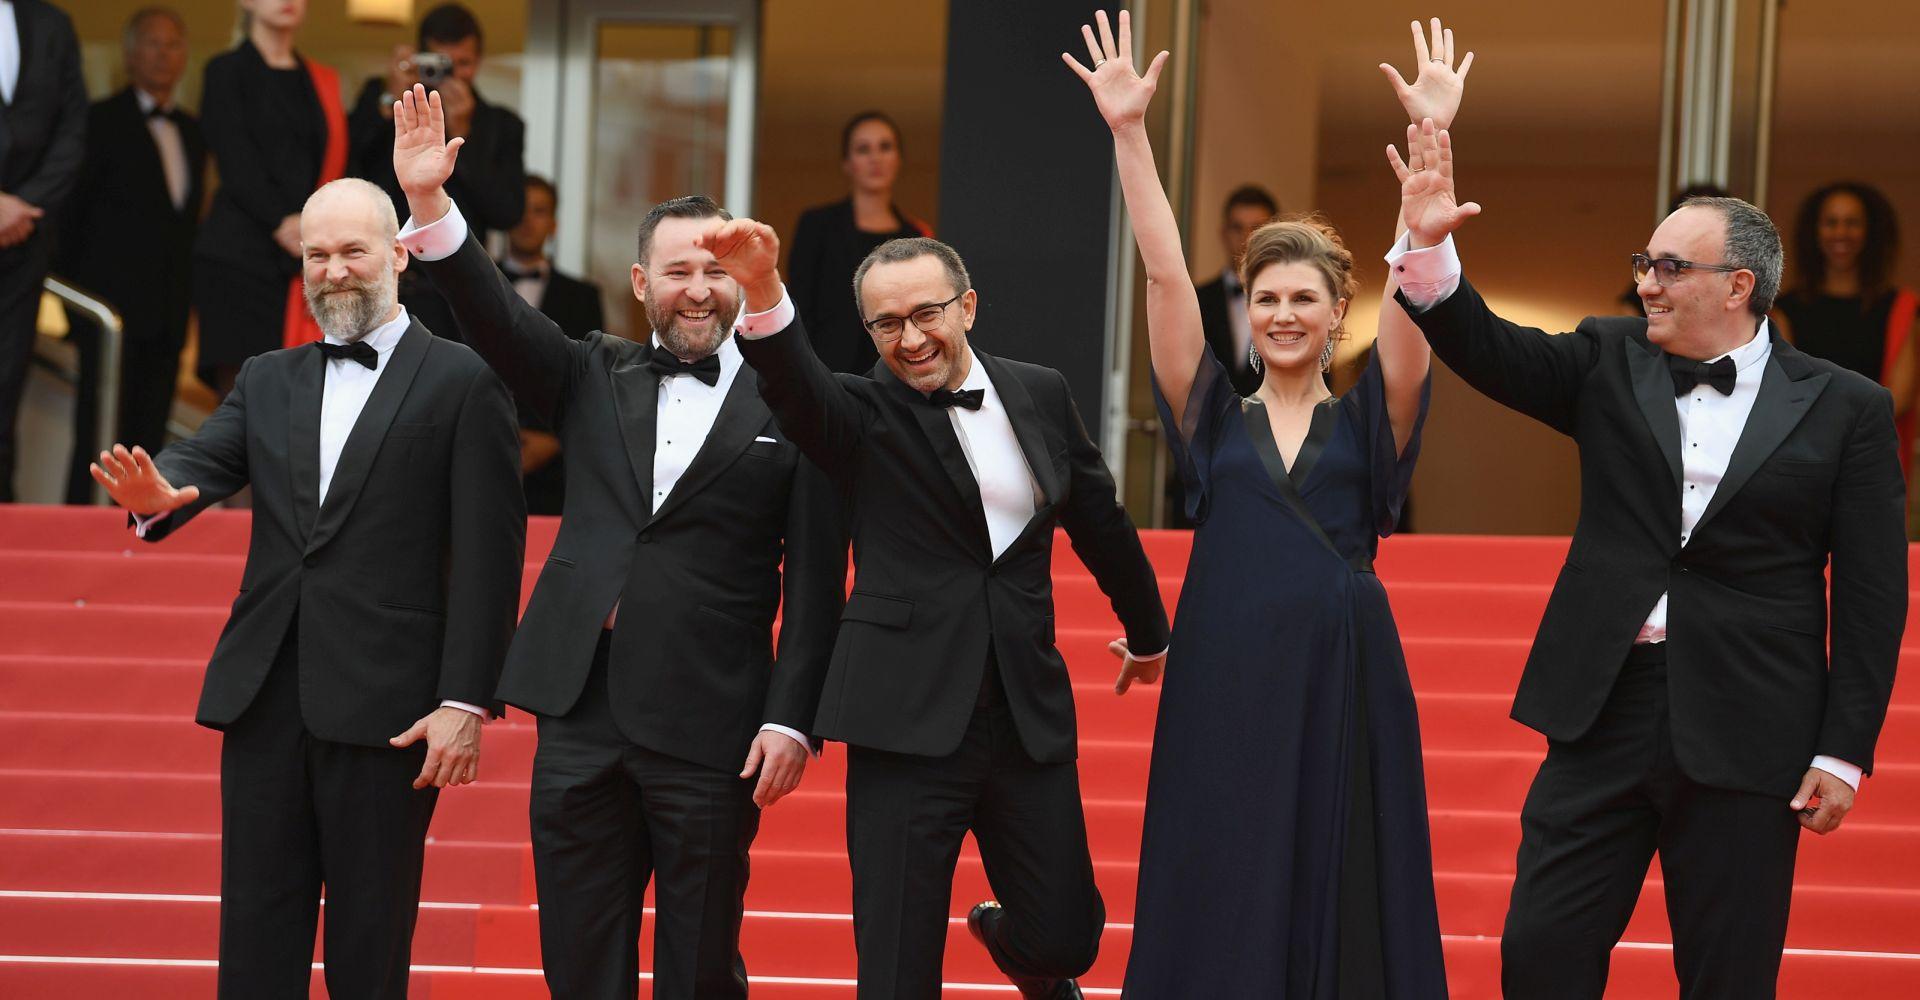 CANNES 2. DAN: Zvyagintsev rastužio rusku vladu, oduševio Cannes